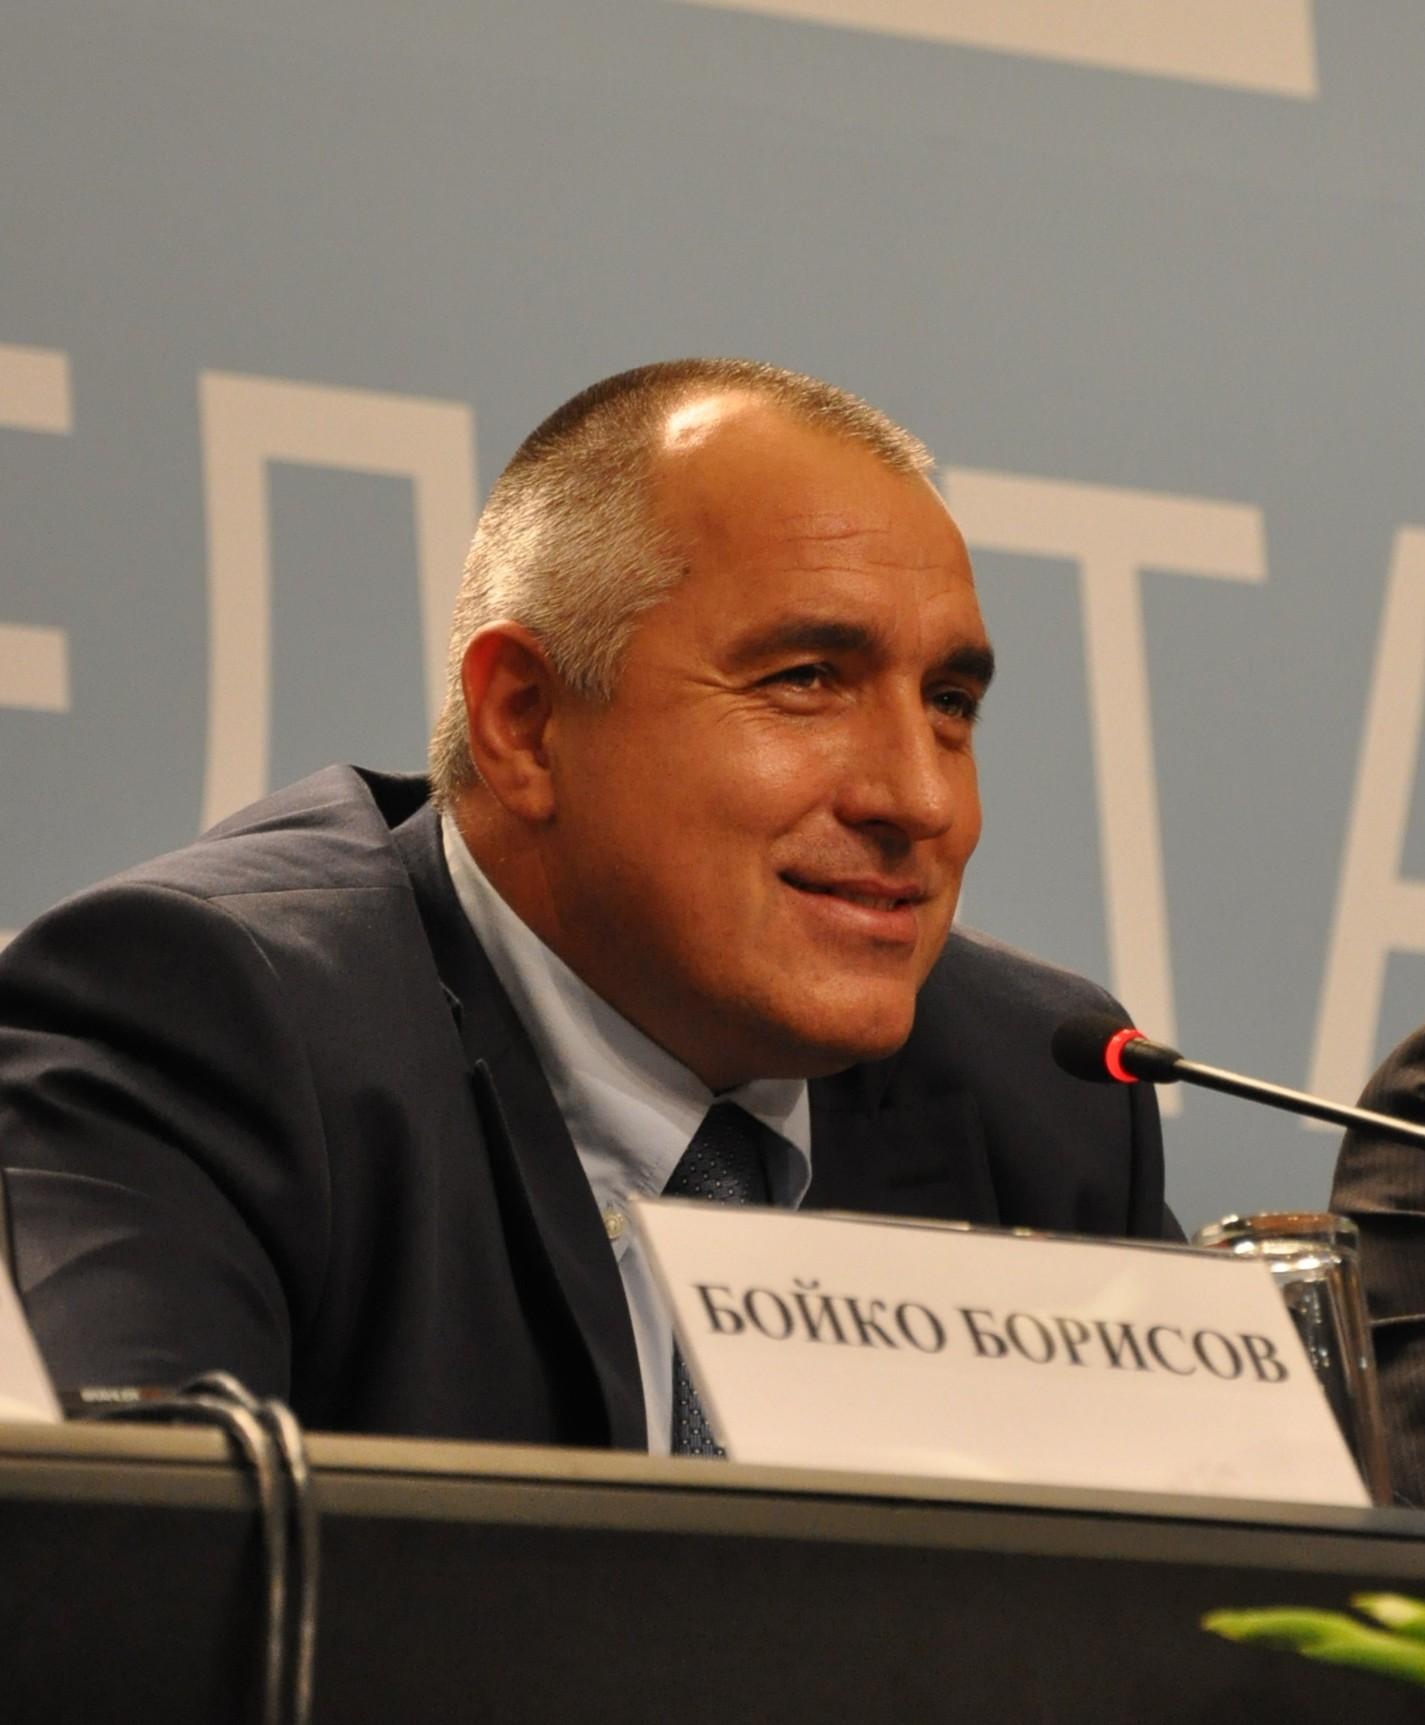 Bulgarian PM optimistic on gas link to Turkey